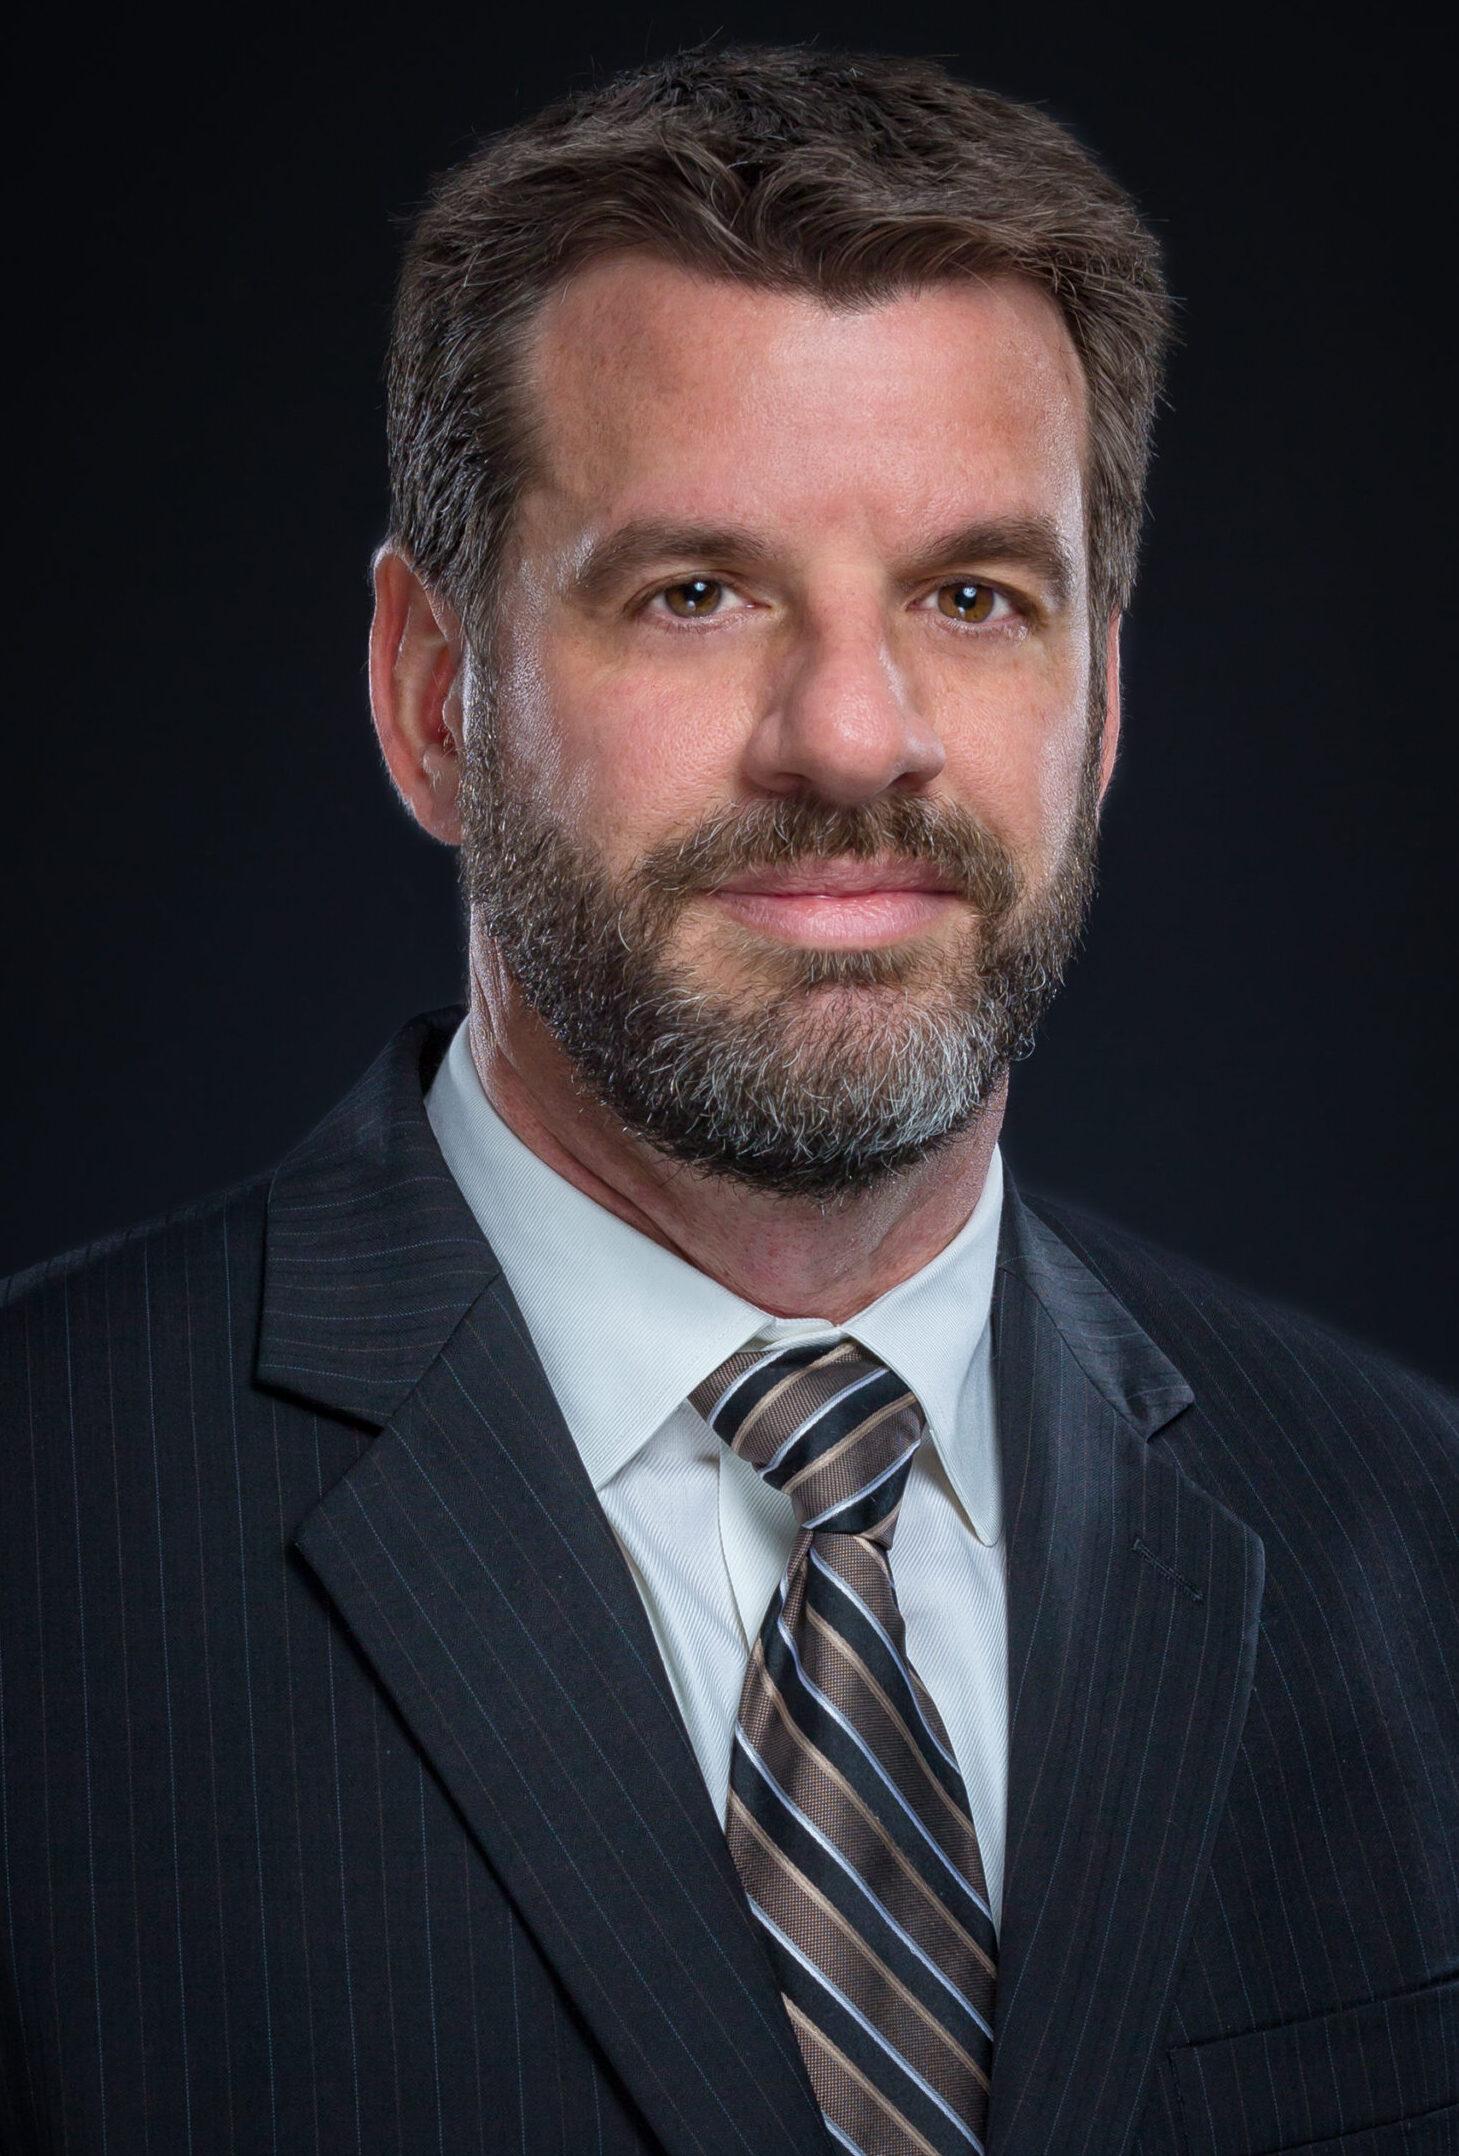 Matthew B. Schabath, PhD